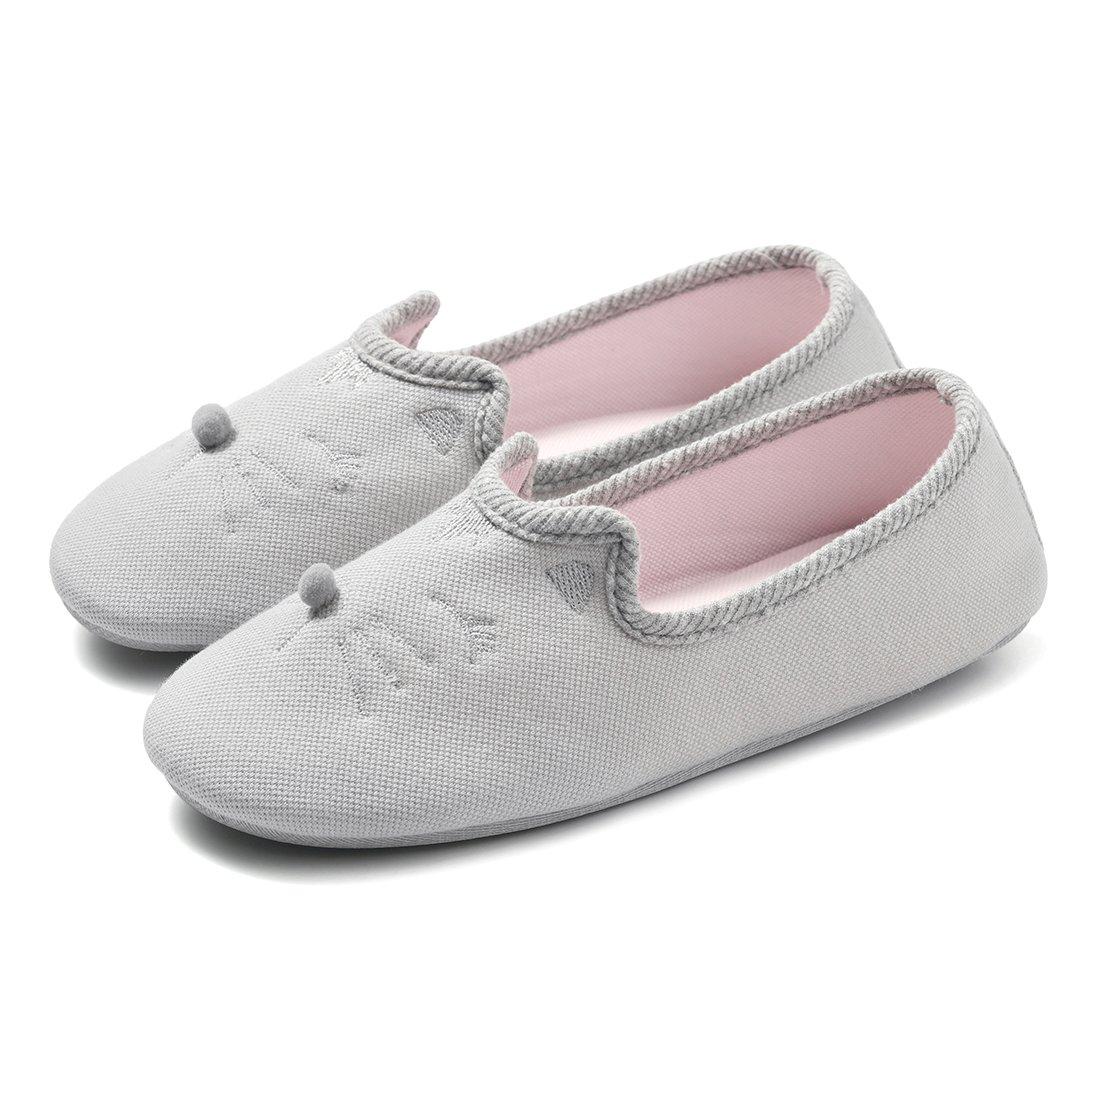 Cellicigal Women Cute Home Ballerina Slippers Comfort Animal Non Slip Indoor Shoes 34859 (7.5-8 B(M) US, Grey)